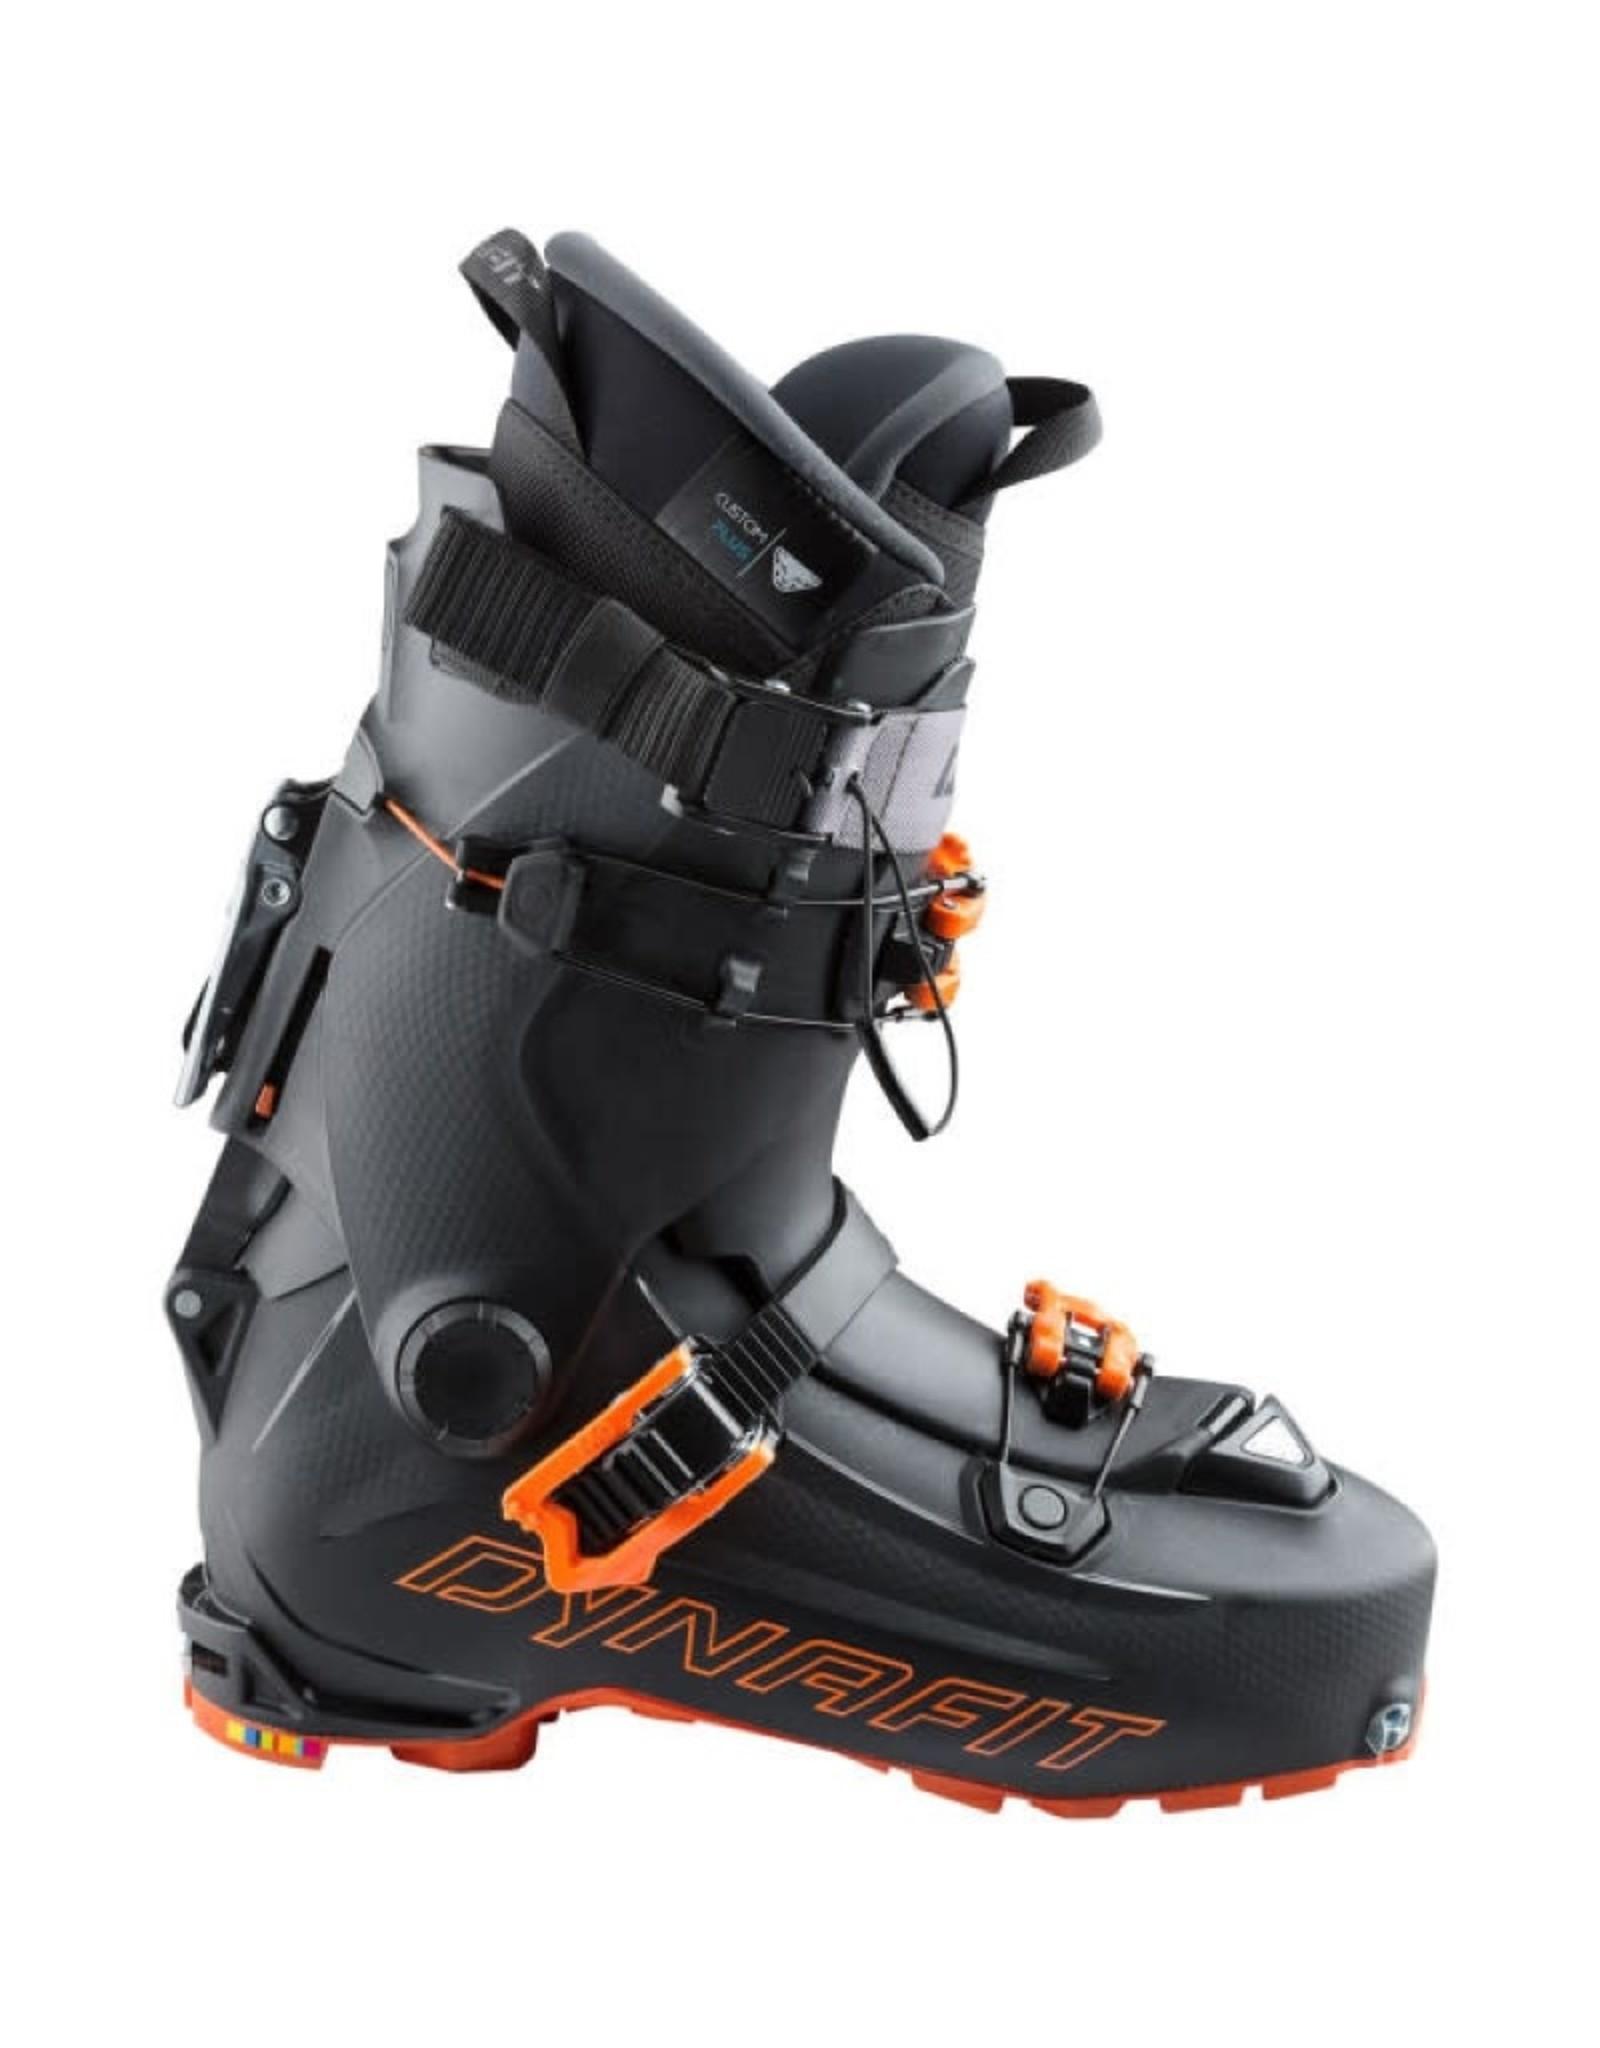 Dynafit Hoji Pro Tour AT Ski Boots